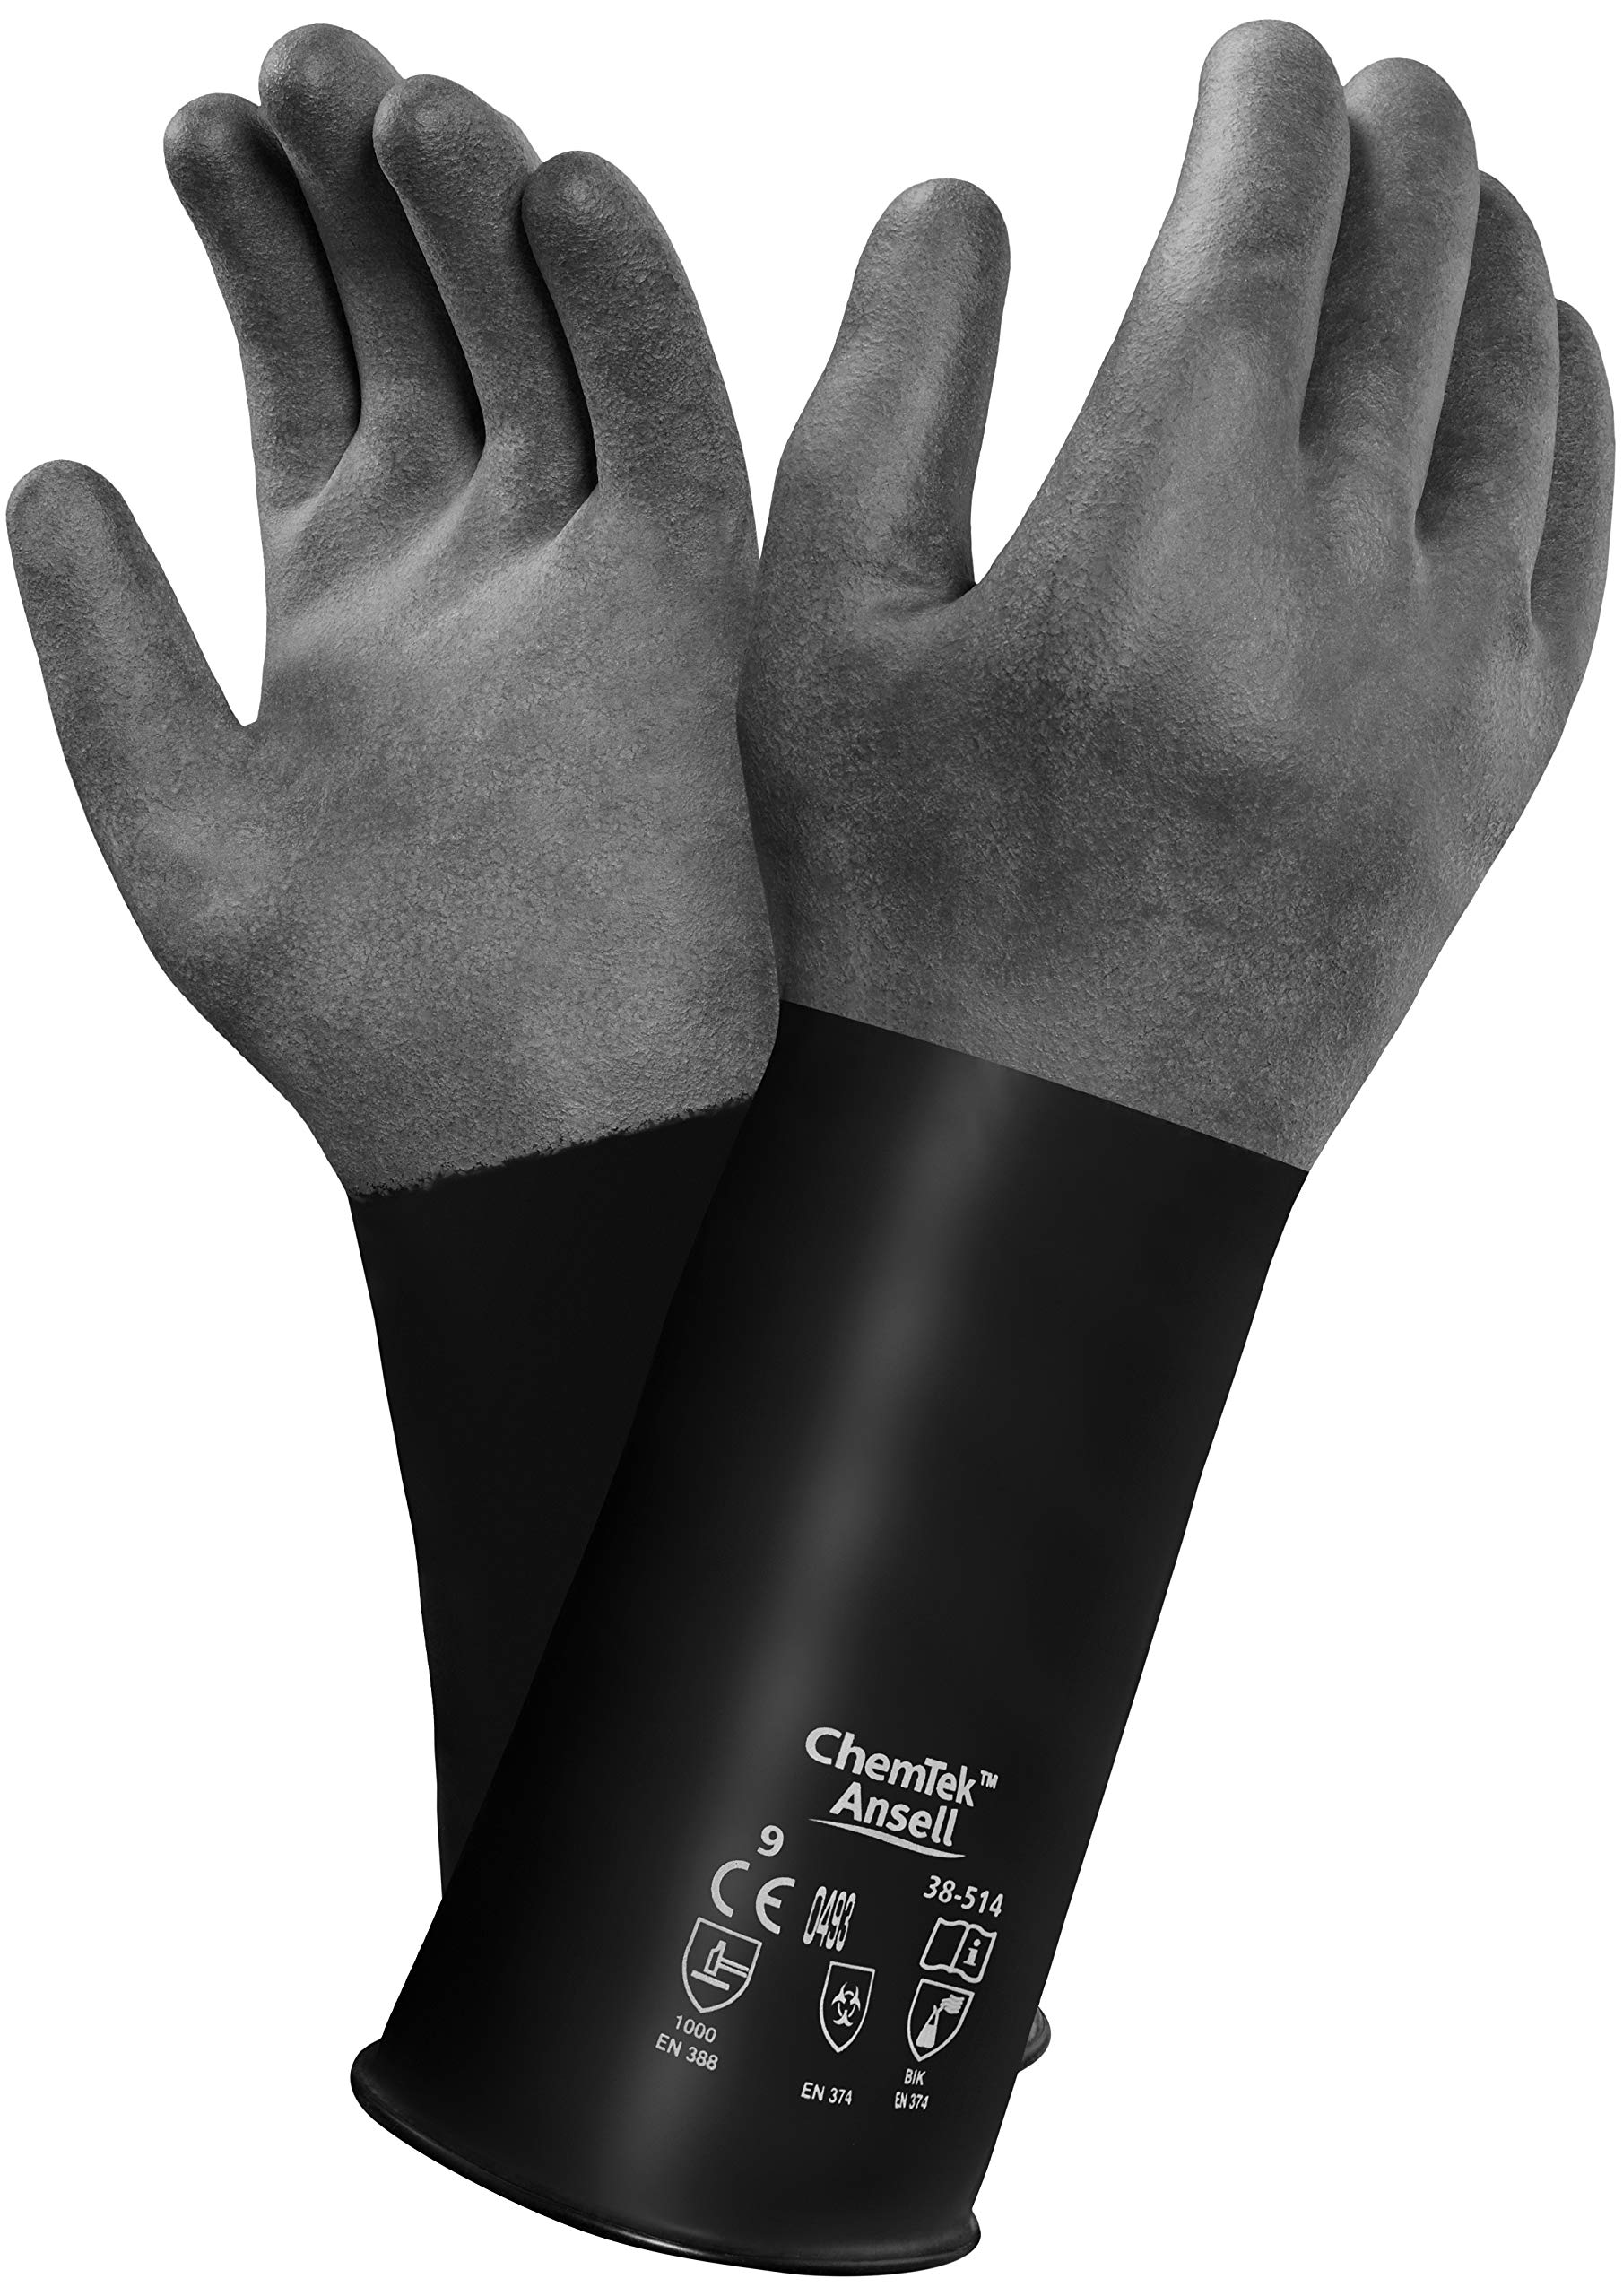 Ansell 103203 Chemtek Smooth Finish Butyl Glove with Beaded Cuff, Capacity, Volume, Butyl, 9, Black